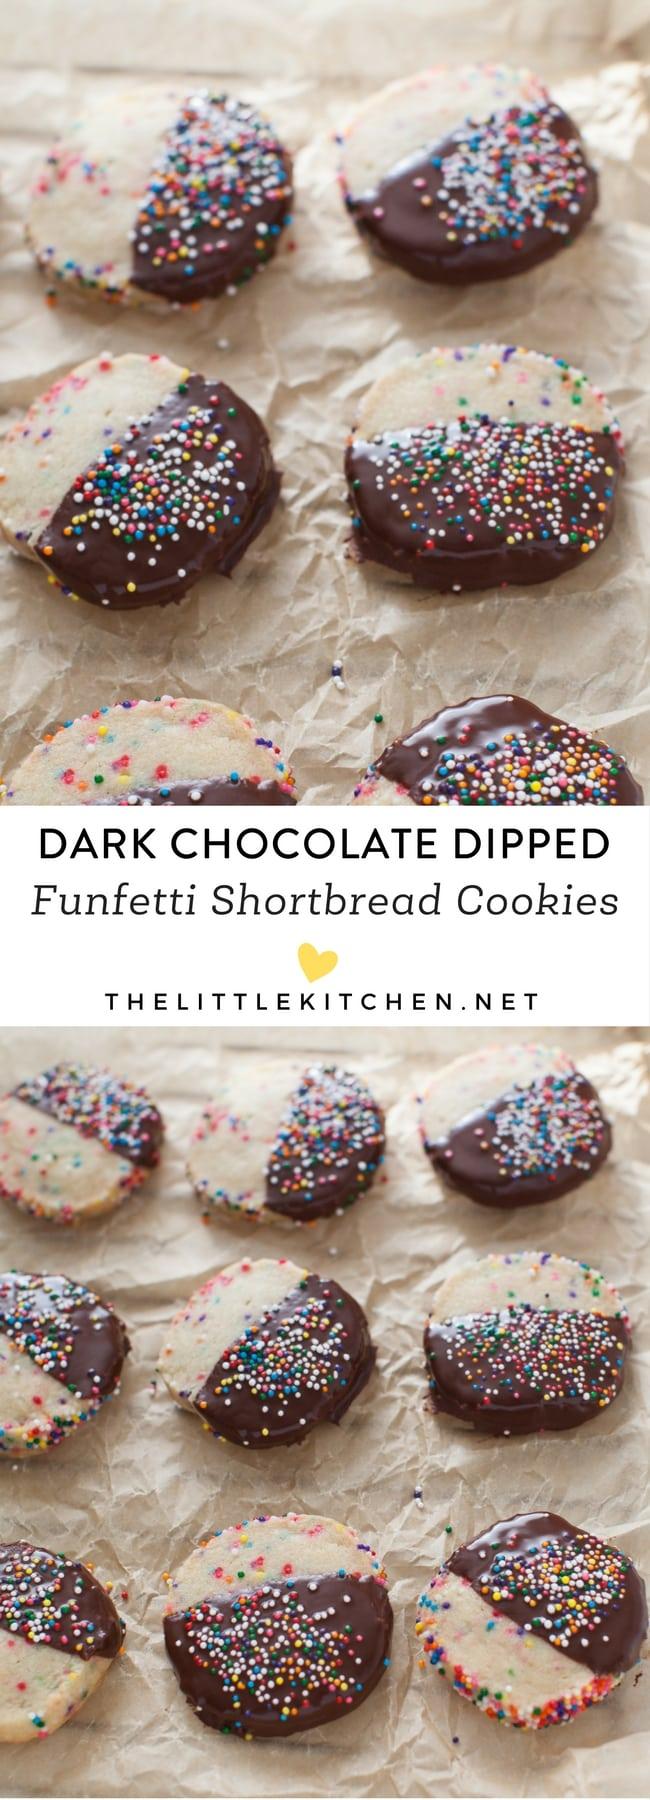 Dark Chocolate Dipped Funfetti Shortbread Cookies from thelittlekitchen.net